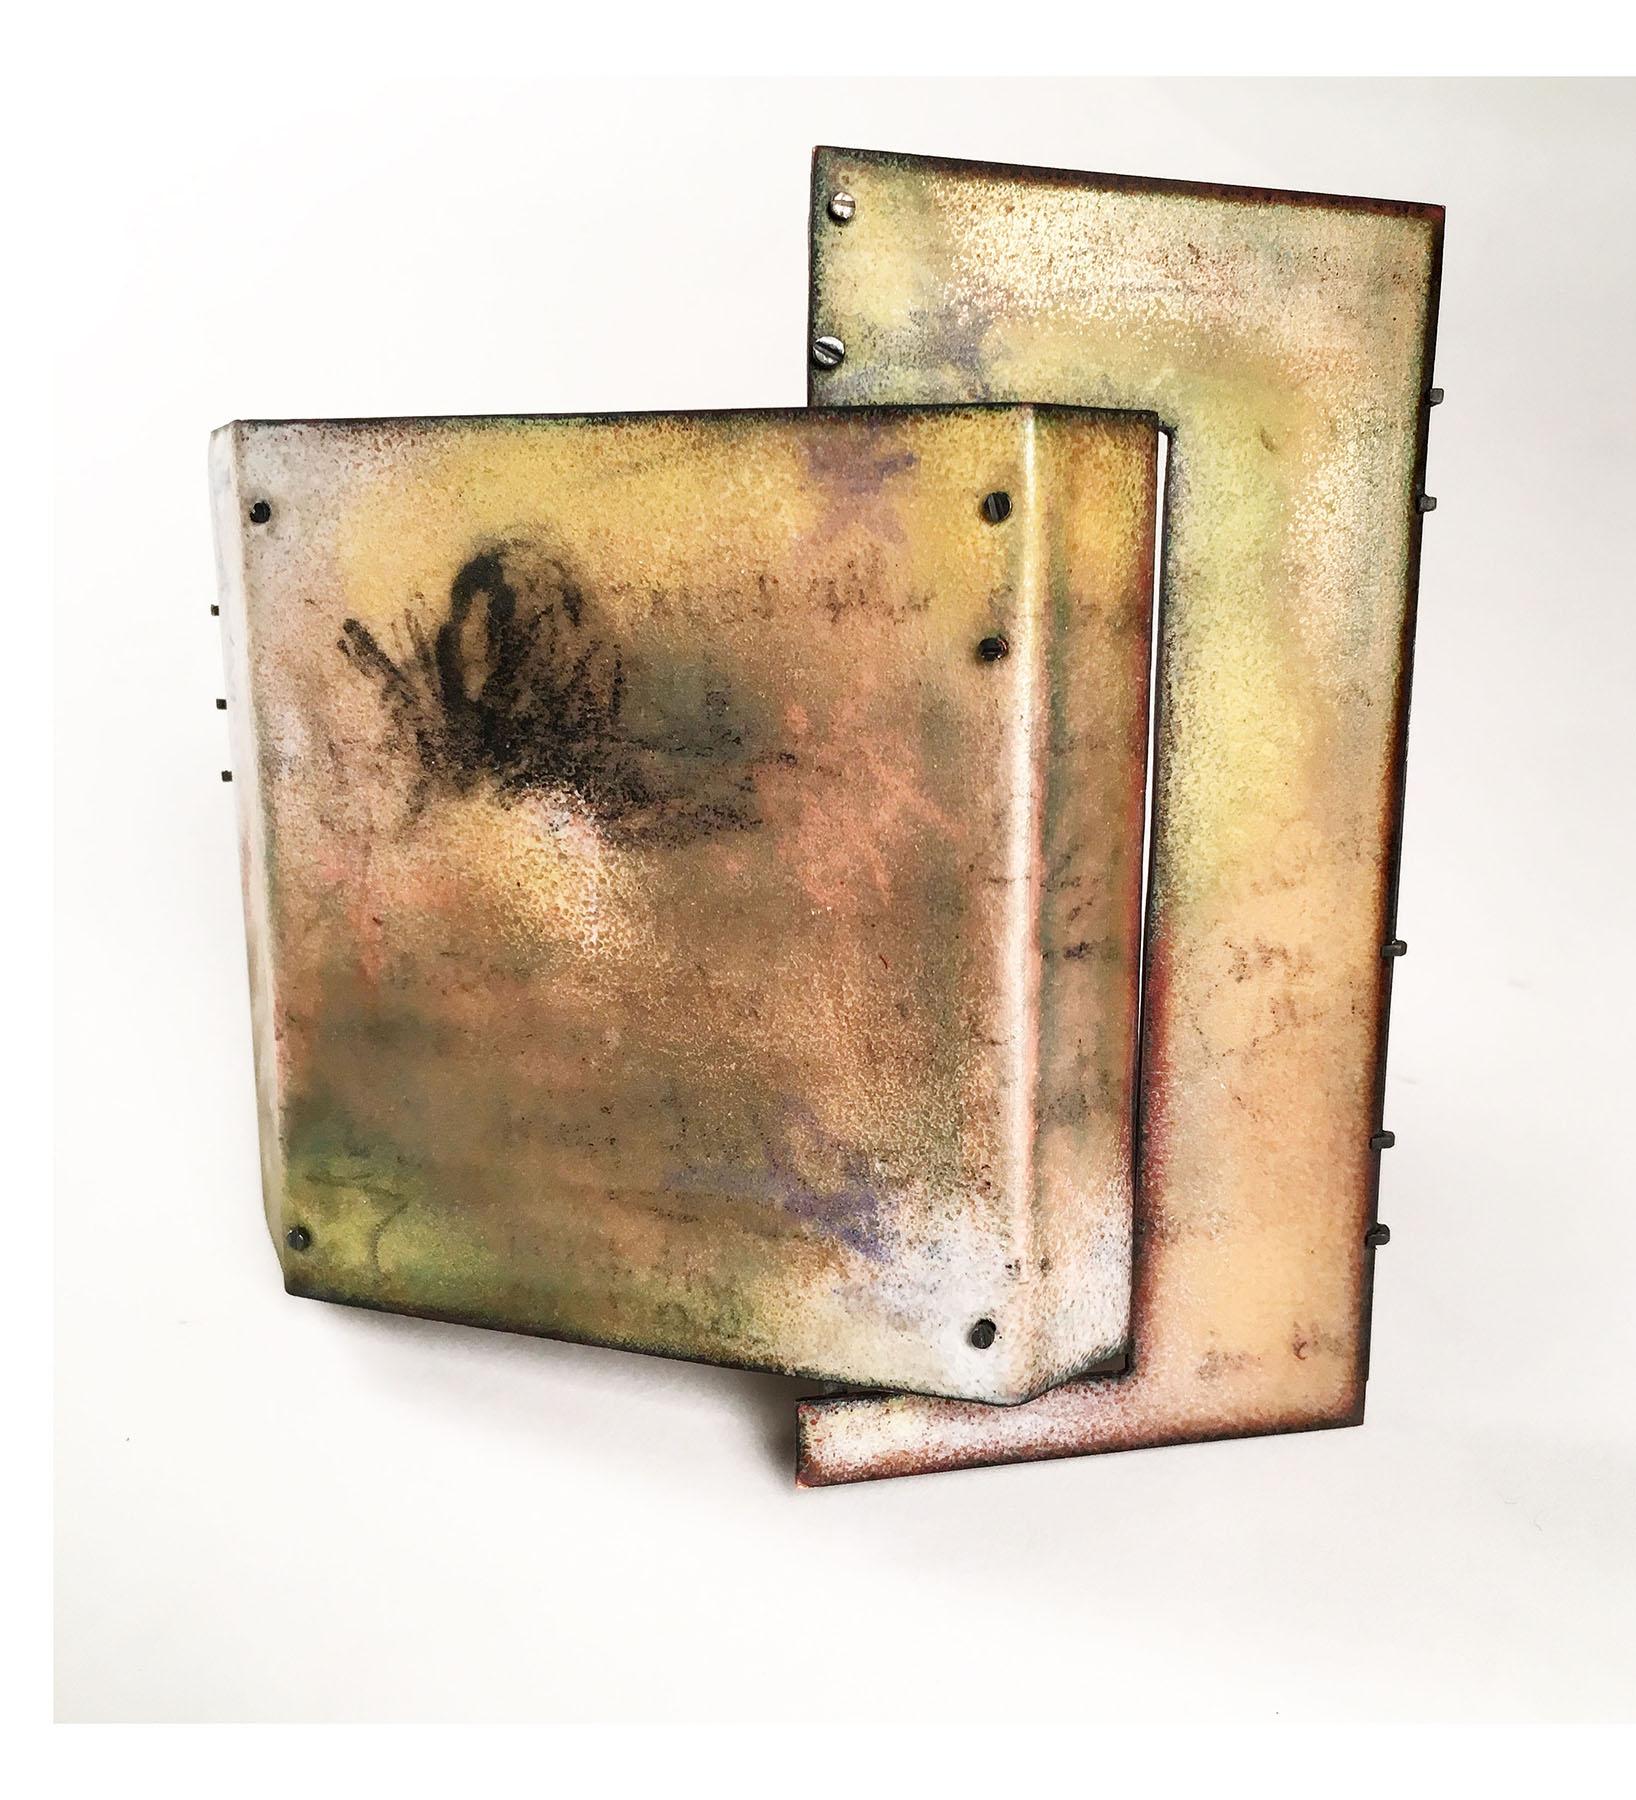 Kim Paquet  Trust the Process  (2018) Silver, copper, enamel, steel